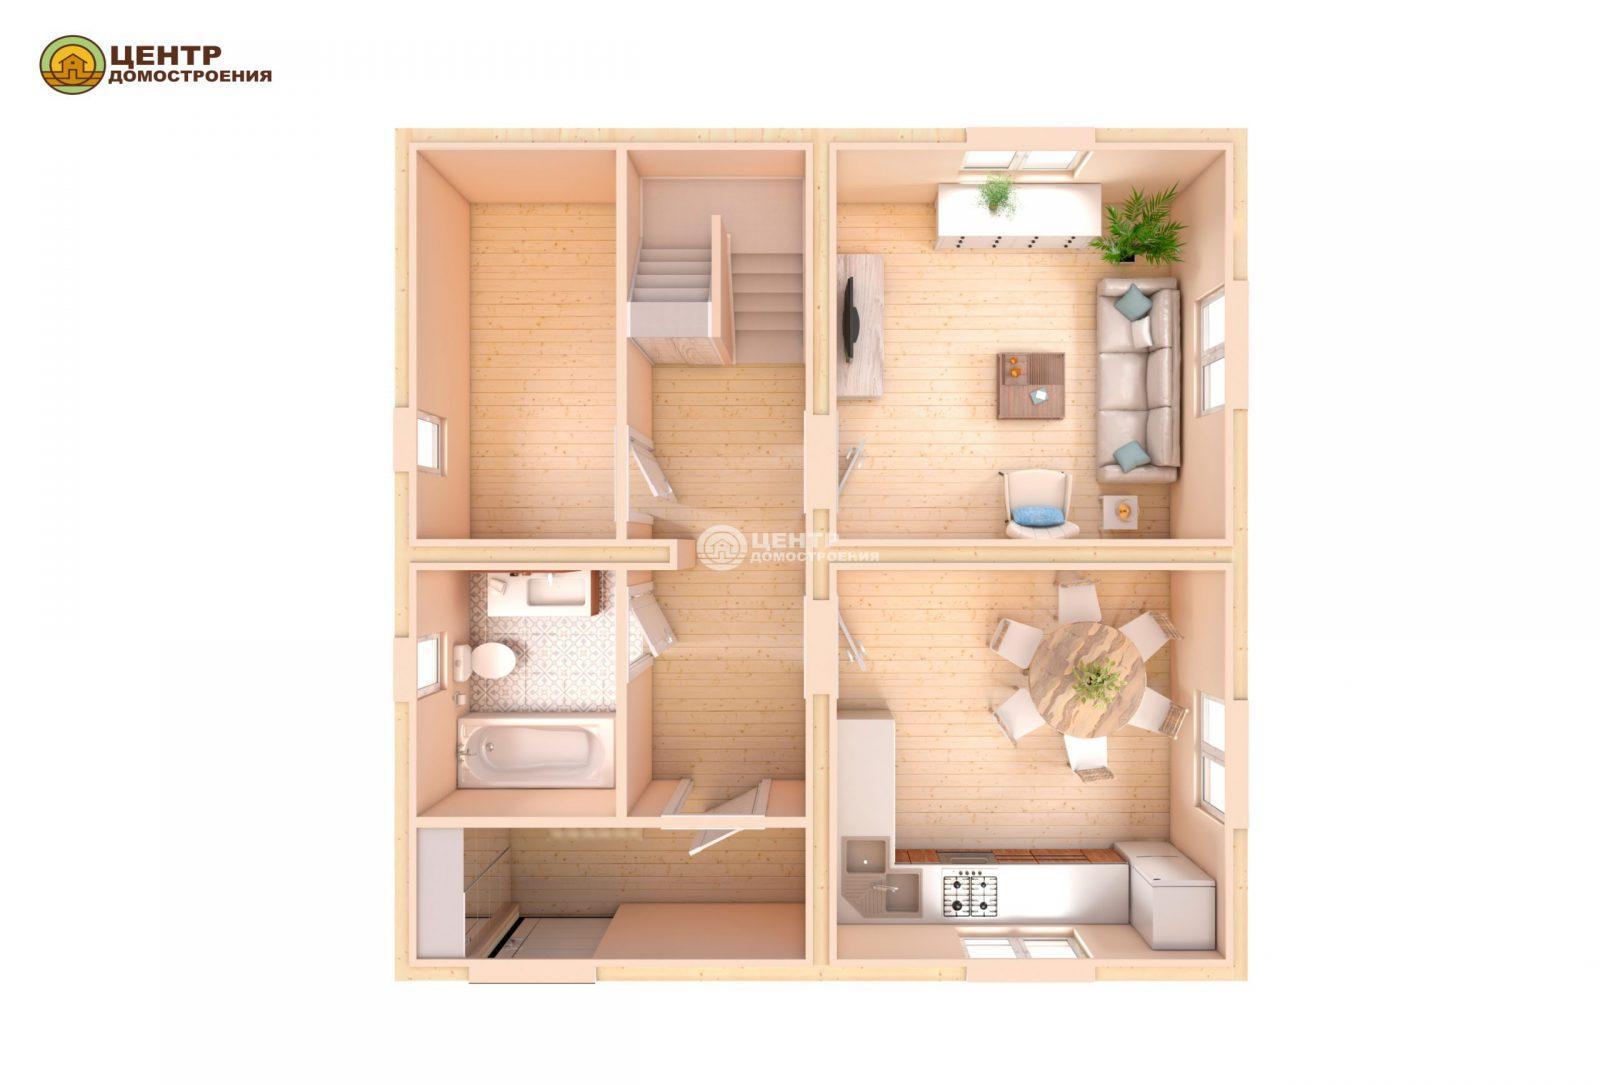 Проект деревянного дома 8 на 8